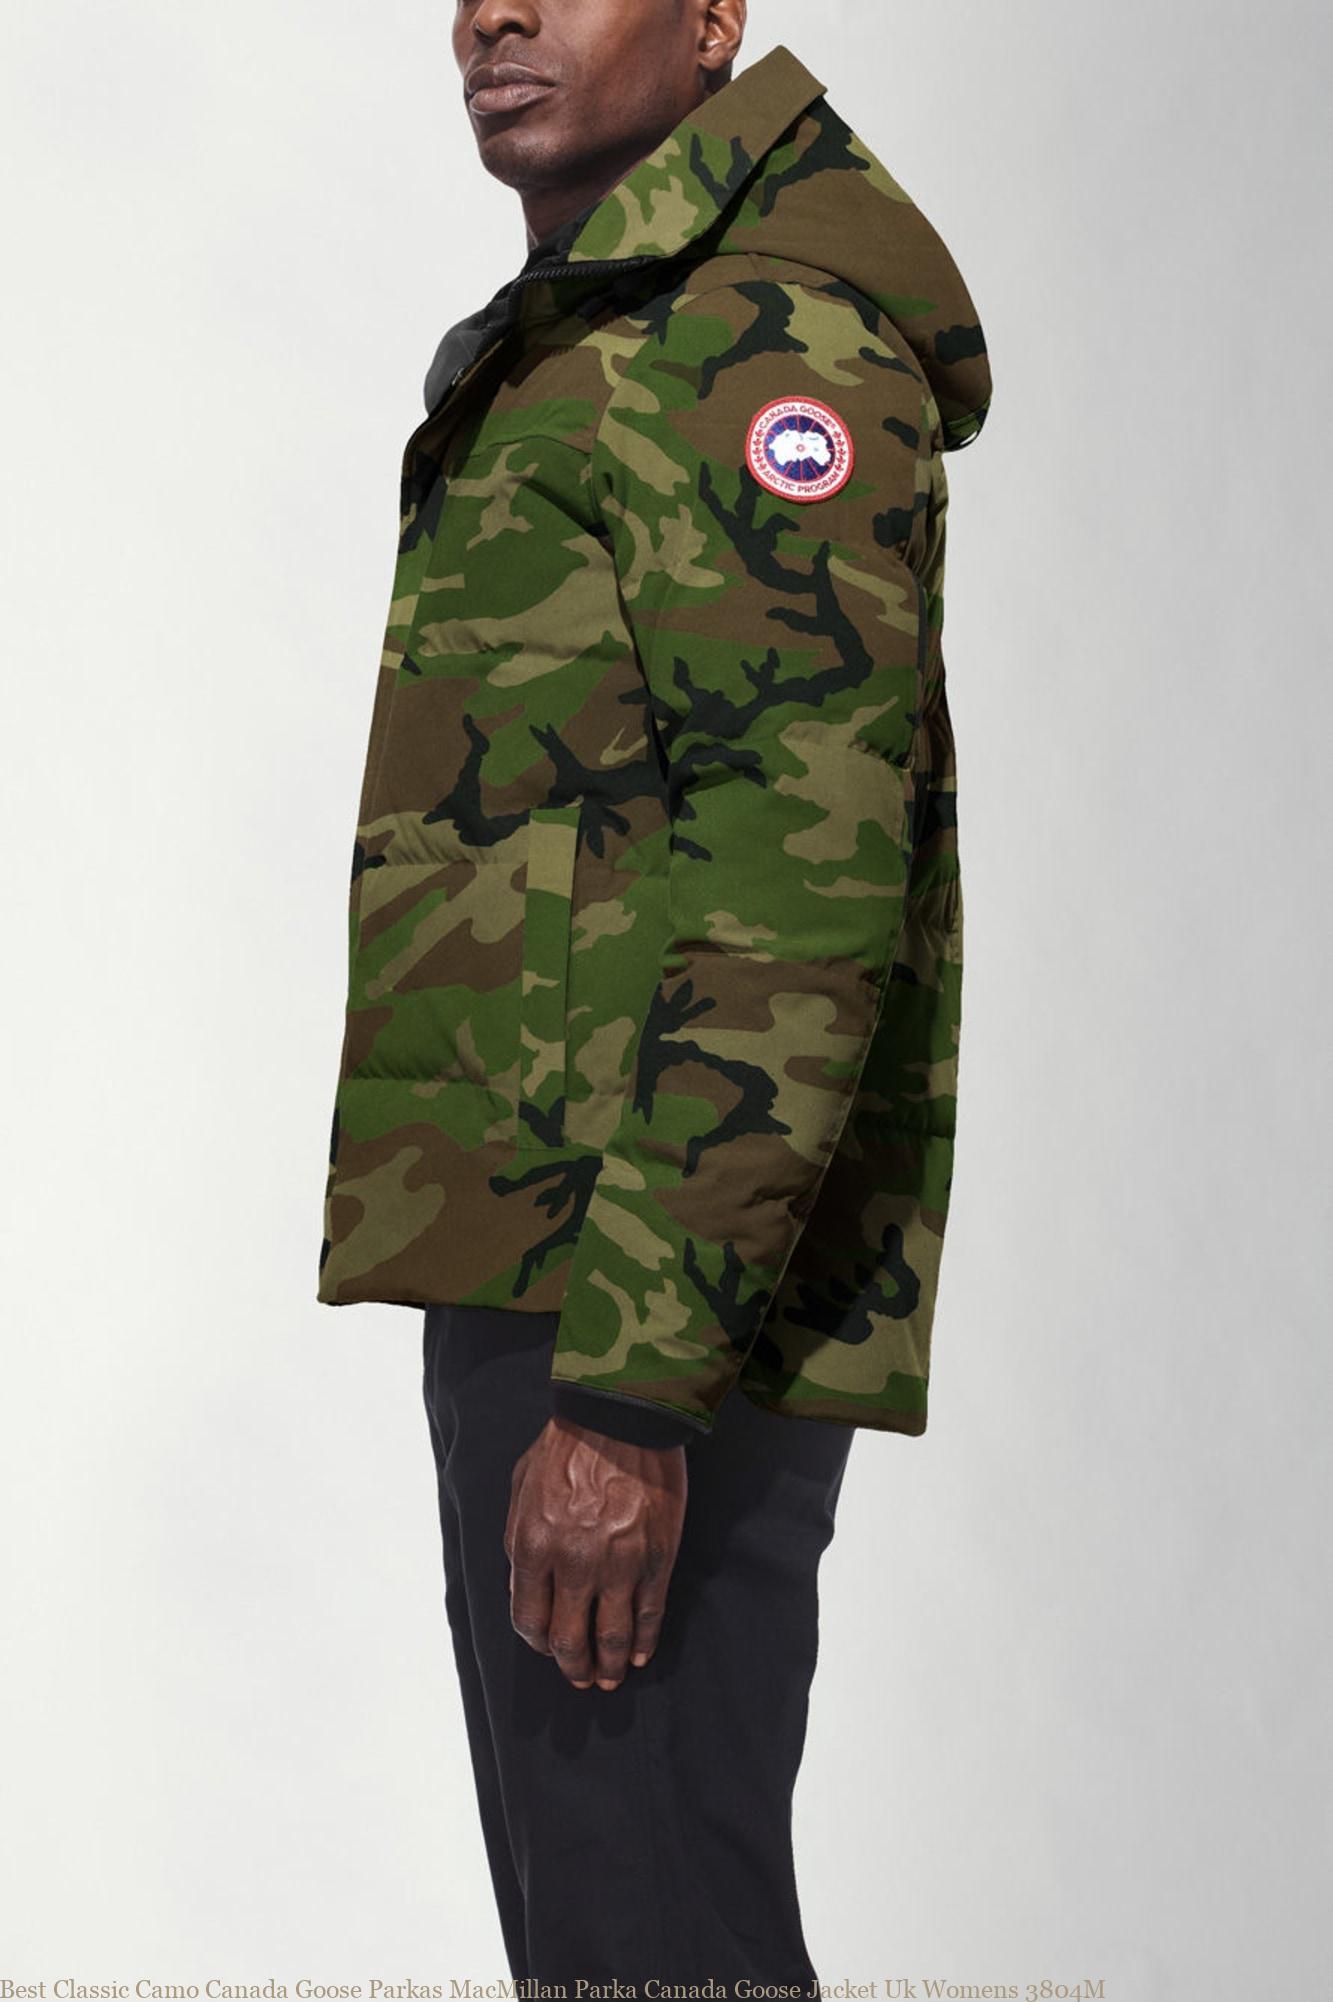 b6059e769e175 Best Classic Camo Canada Goose Parkas MacMillan Parka Canada Goose Jacket  Uk Womens 3804M – Cheap Canada Goose Coats Outlet Sale Black Friday